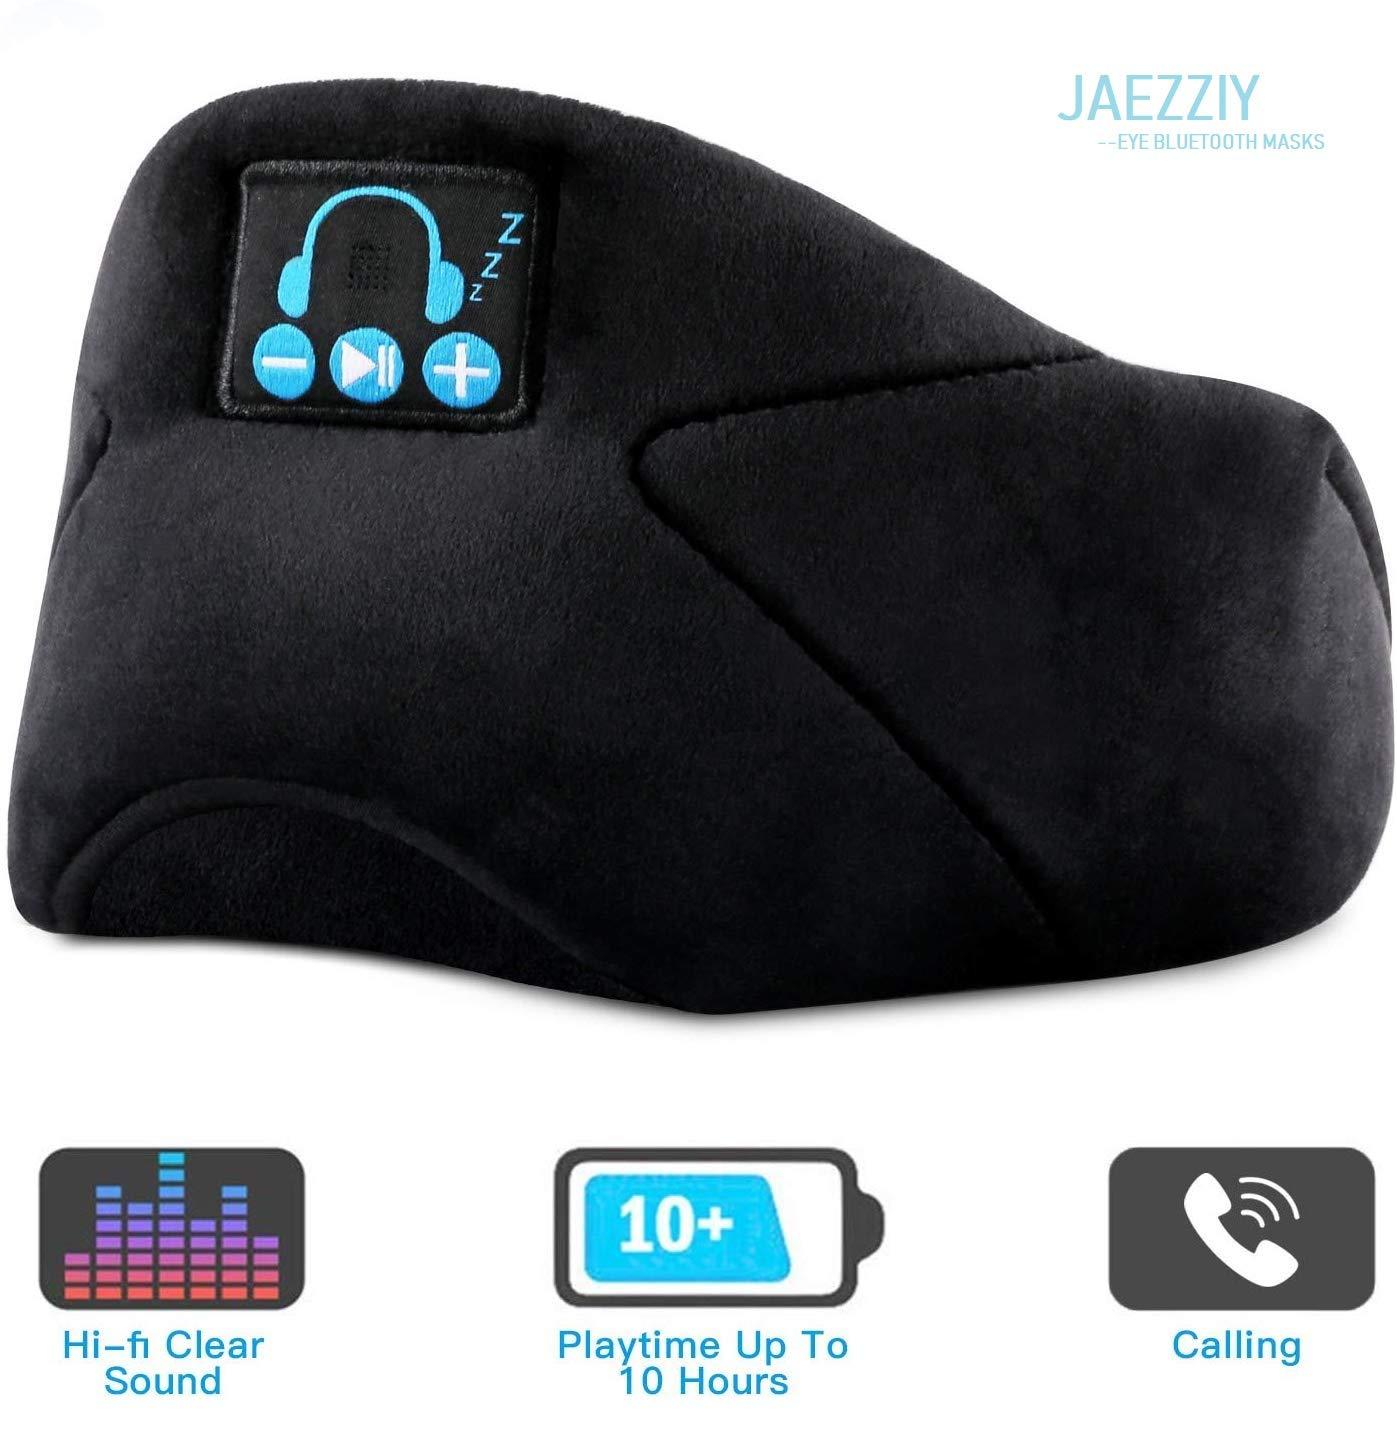 Sleep Headphones Bluetooth Eye Mask, JAEZZIY 3D Bluetooth 5.0 Wireless Sleep Mask,Washable Adjustable Travel Music Handsfree Sleeping Headset with Built-in HD Speaker and Micro for Side Sleepers